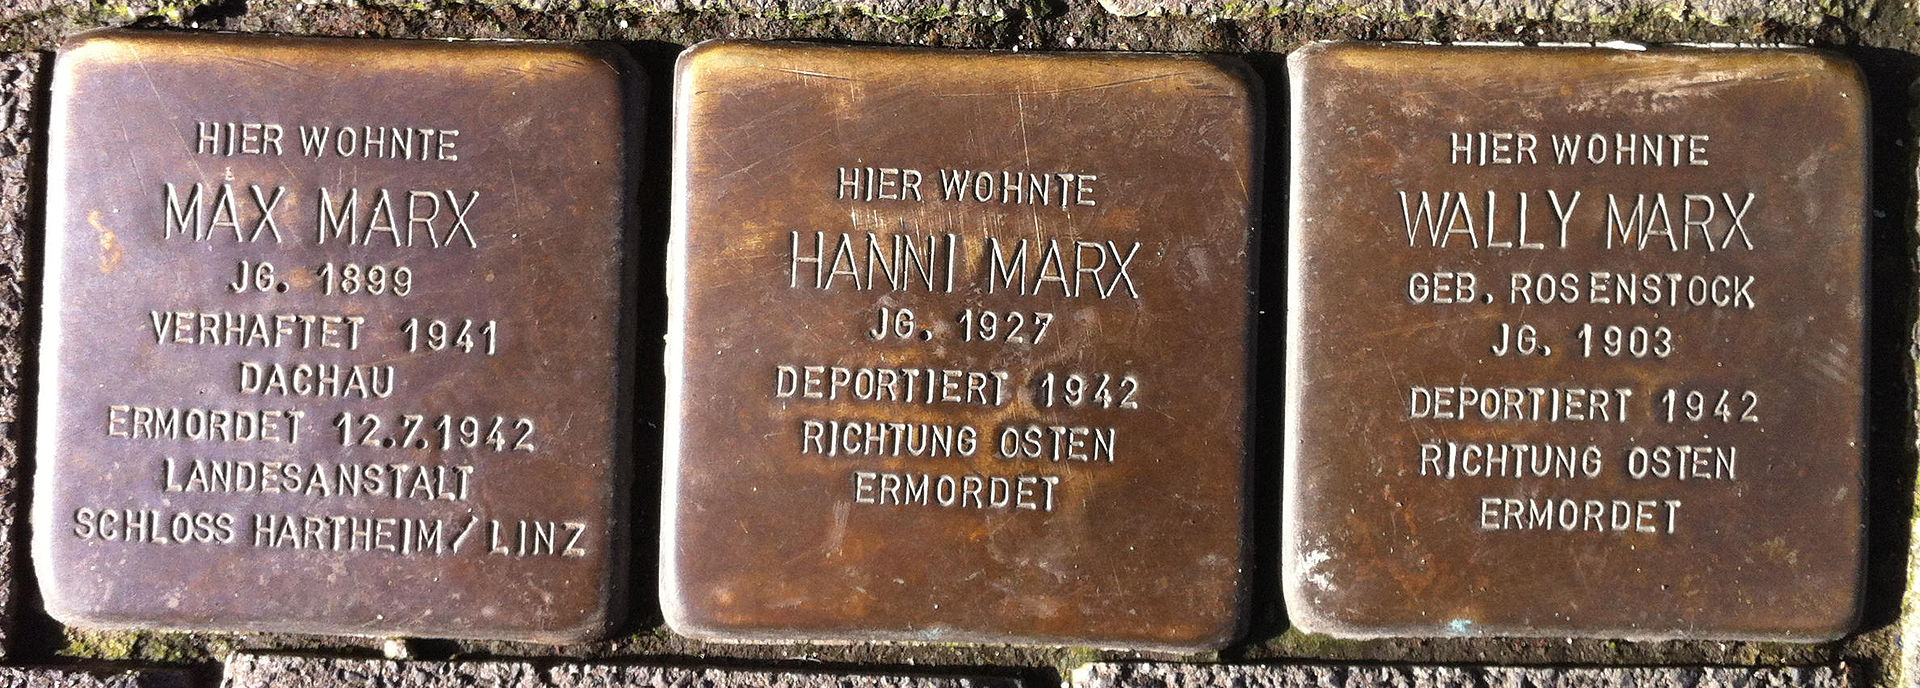 Stolpersteine Max Marx, Hanni Marx, Wally Marx.JPG